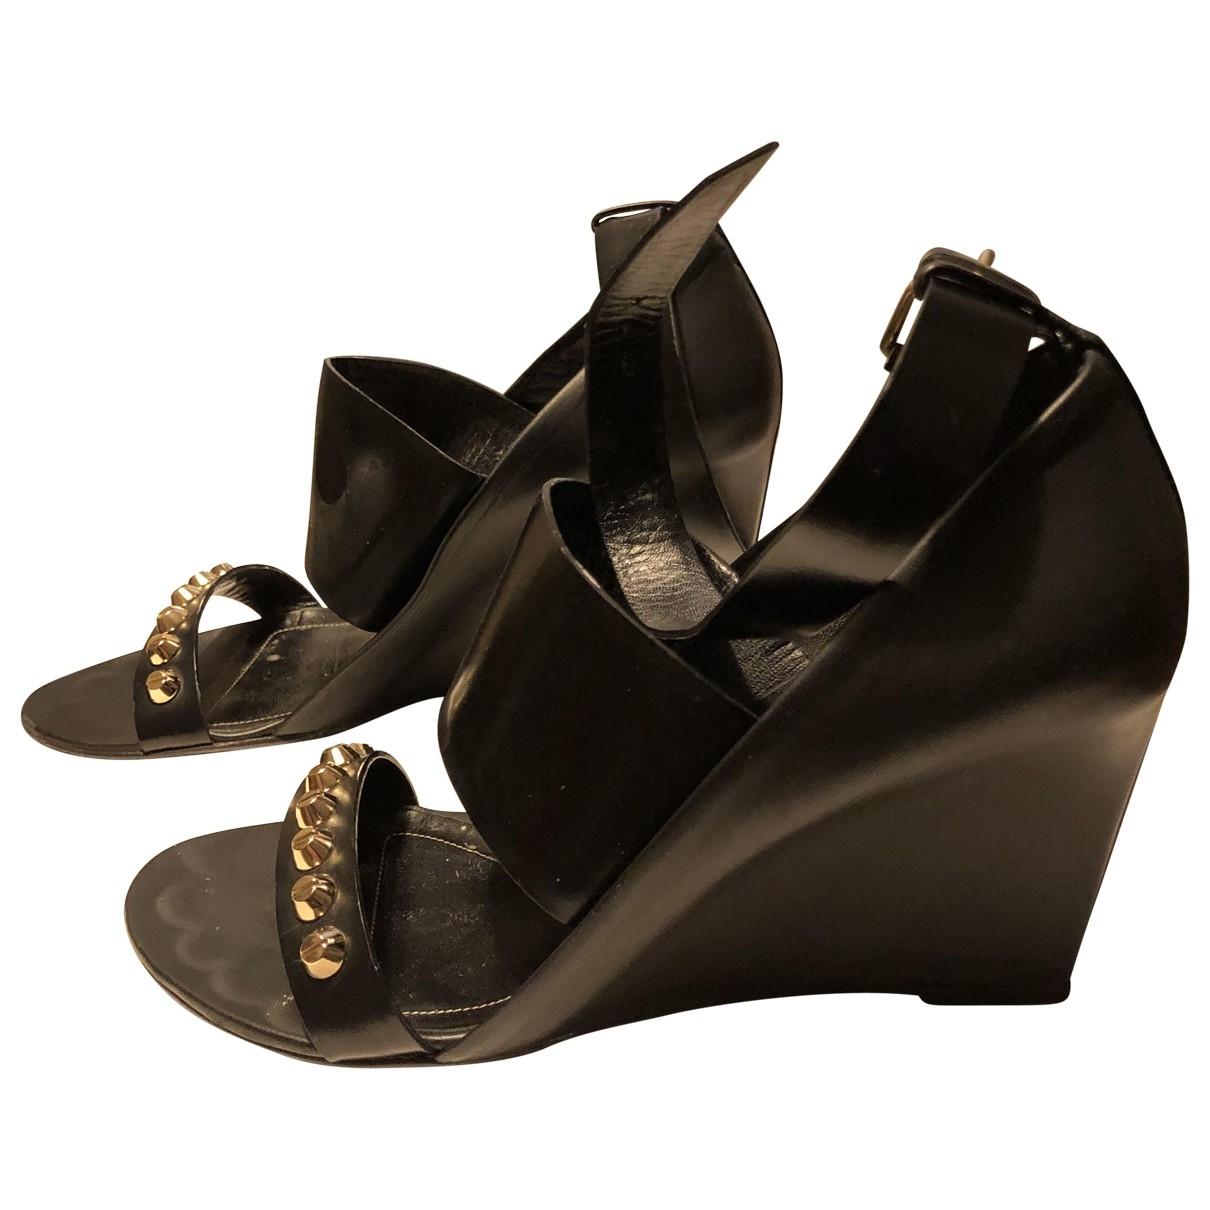 Balenciaga \N Black Leather Sandals for Women 37.5 EU